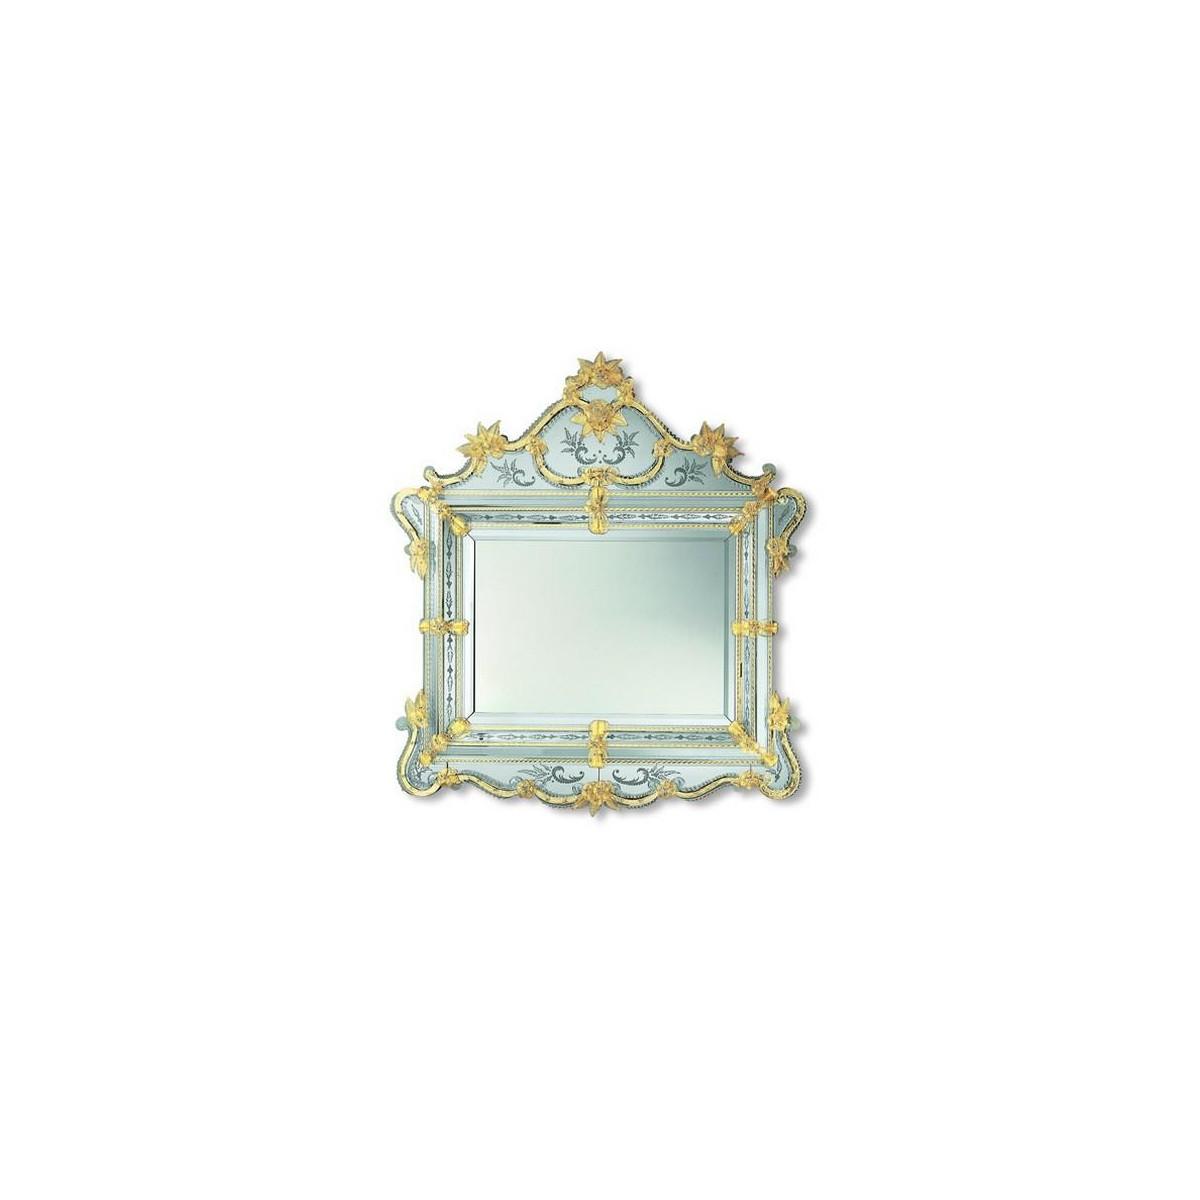 """Selma"" Murano glas venezianischen spiegel"